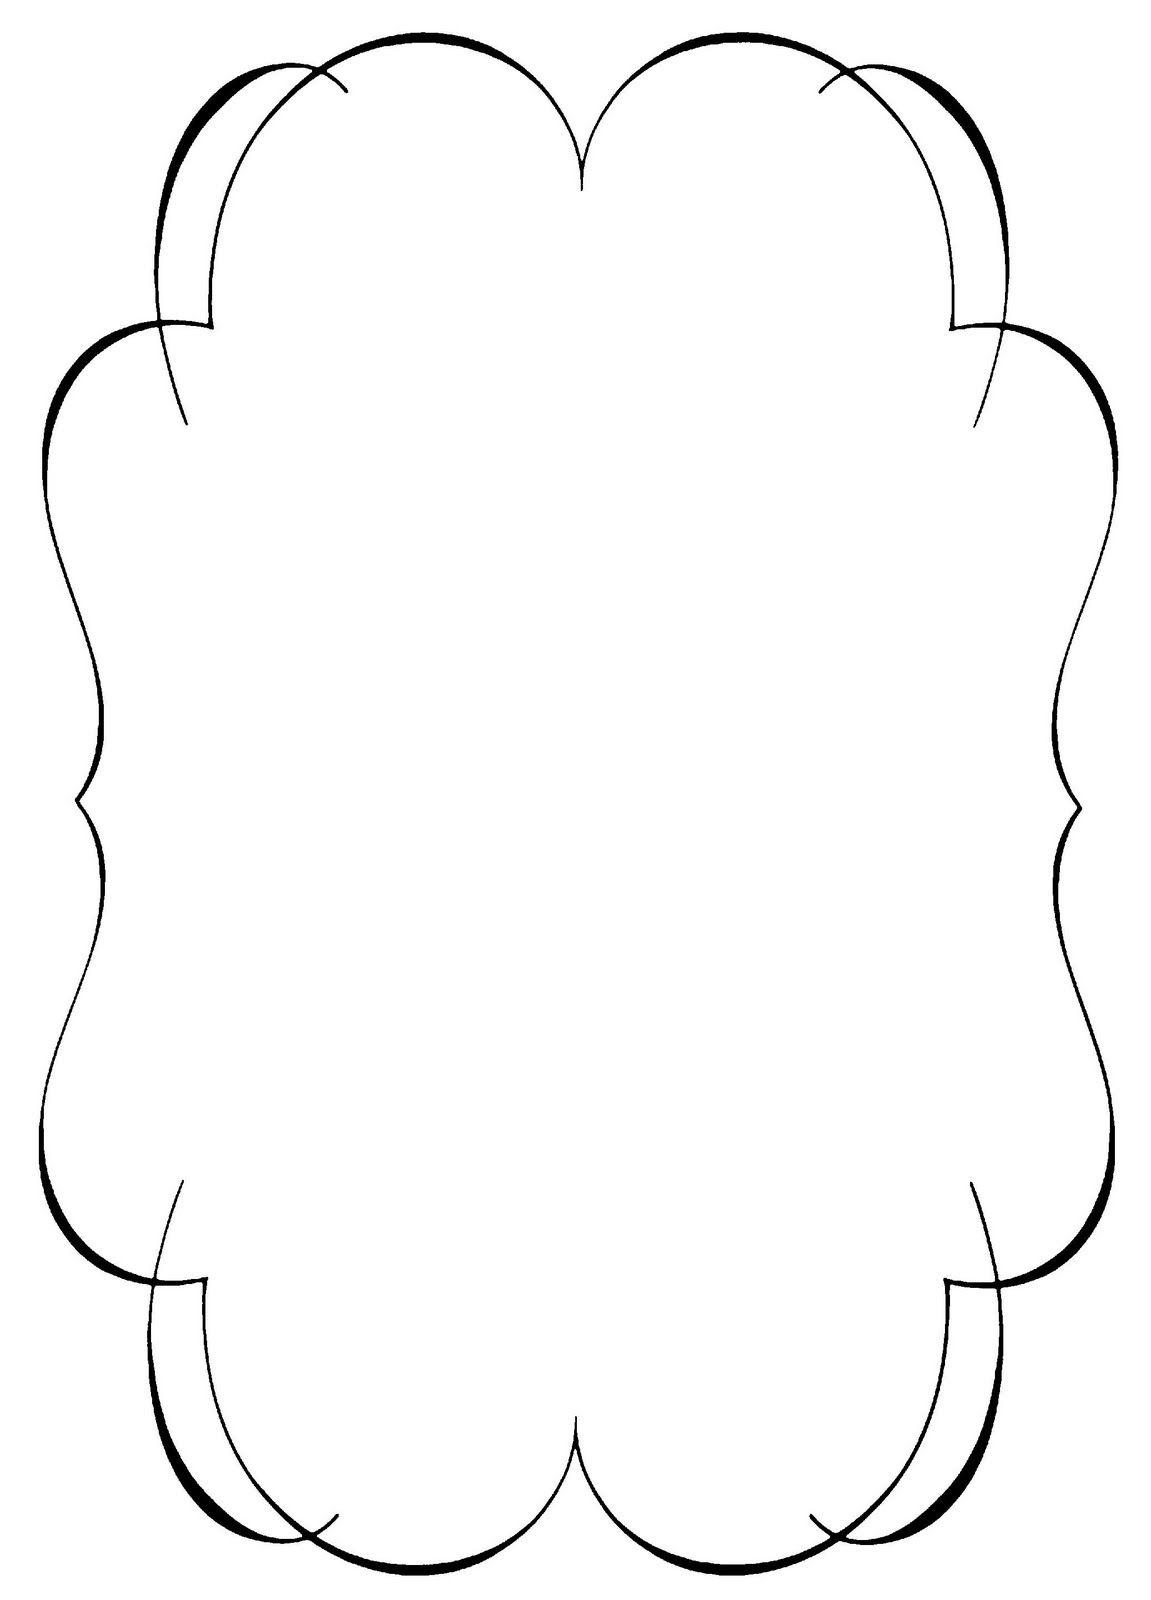 Borders clip art free. Corner clipart simple